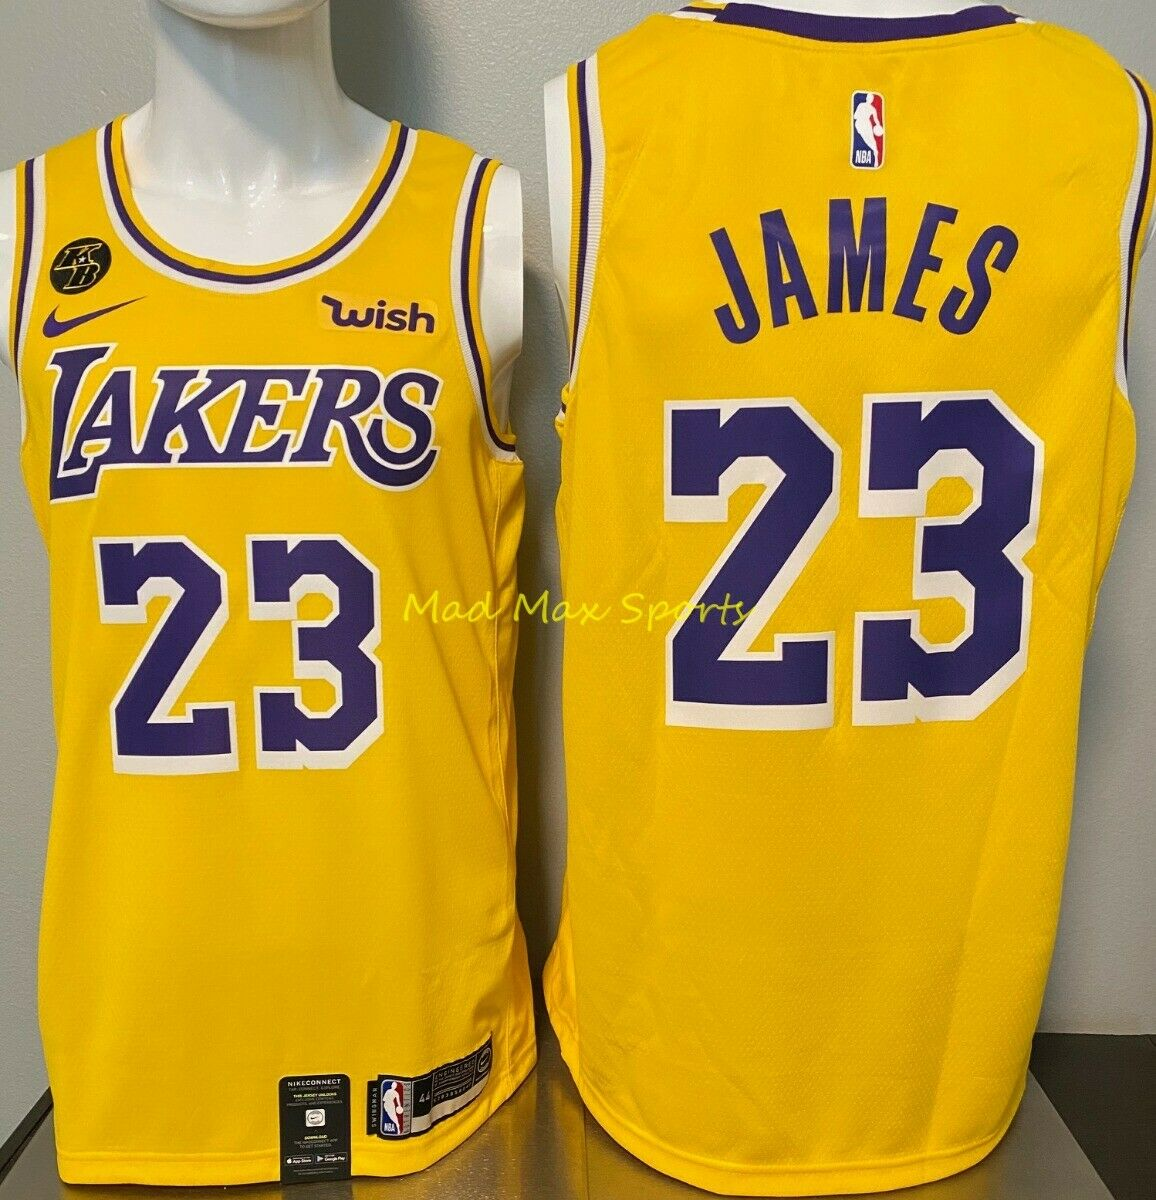 LEBRON JAMES Los Angeles LAKERS Nike WISH Gold KOBE KB Patch Swingman Jersey